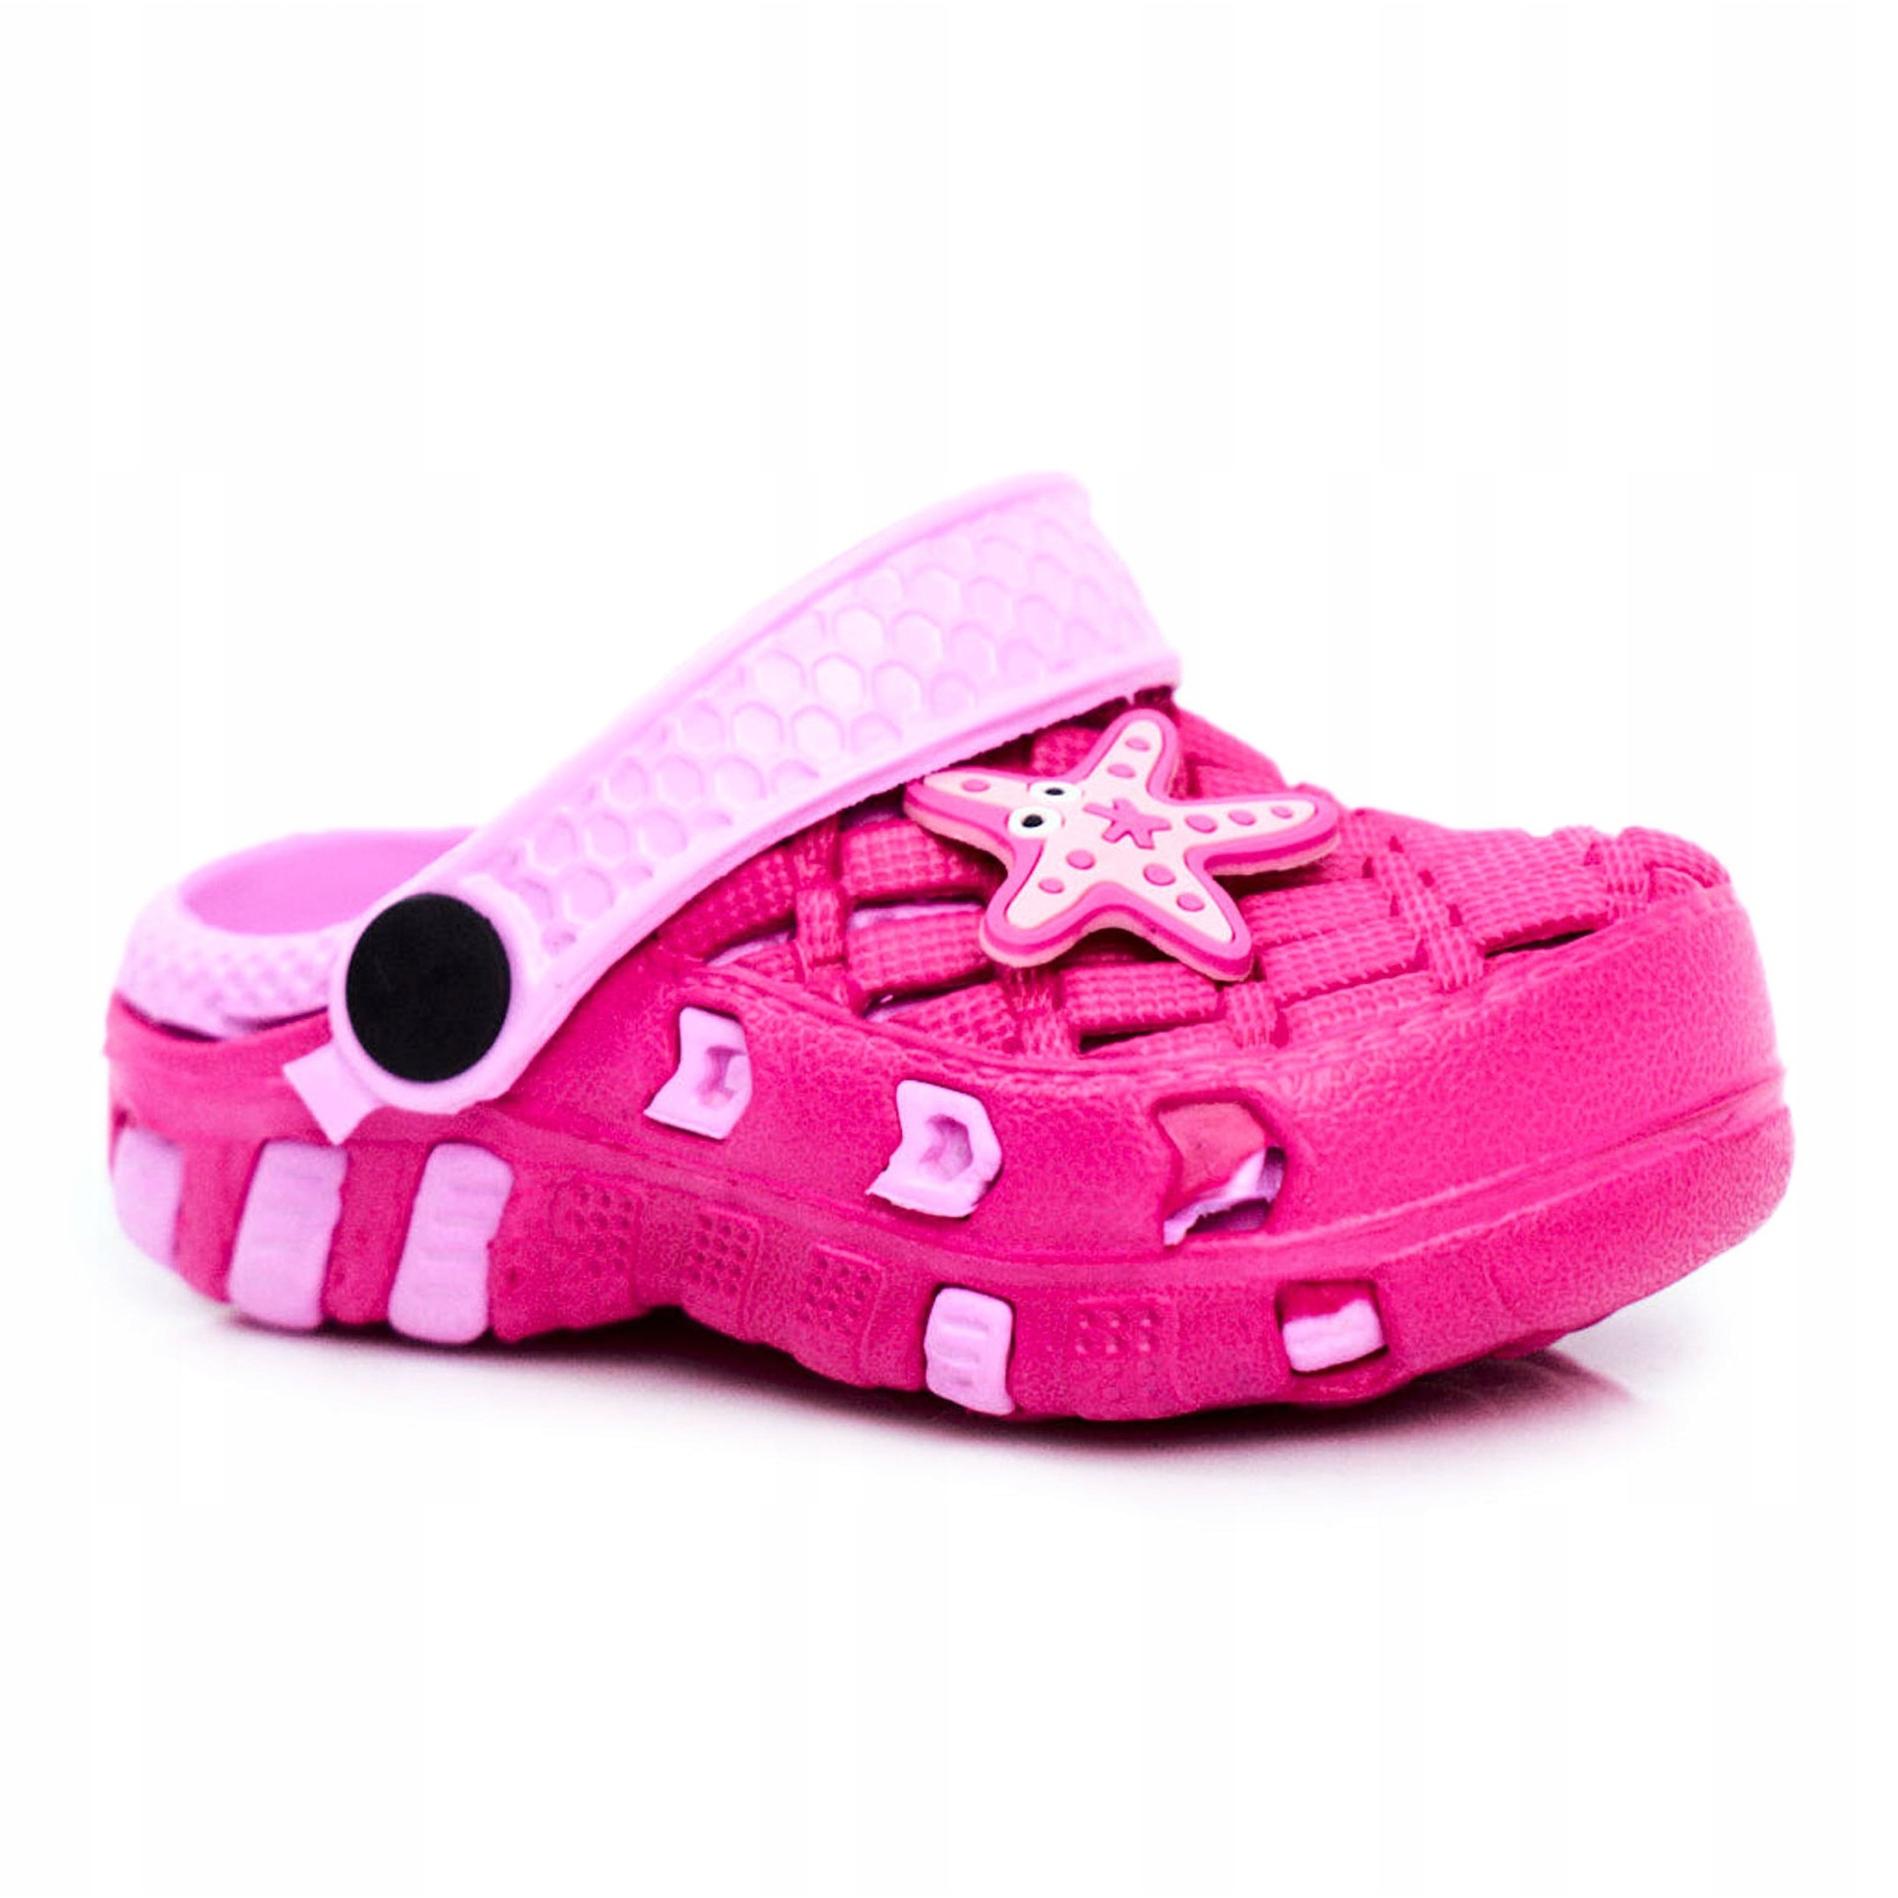 Children's foam slides Crocs Pink